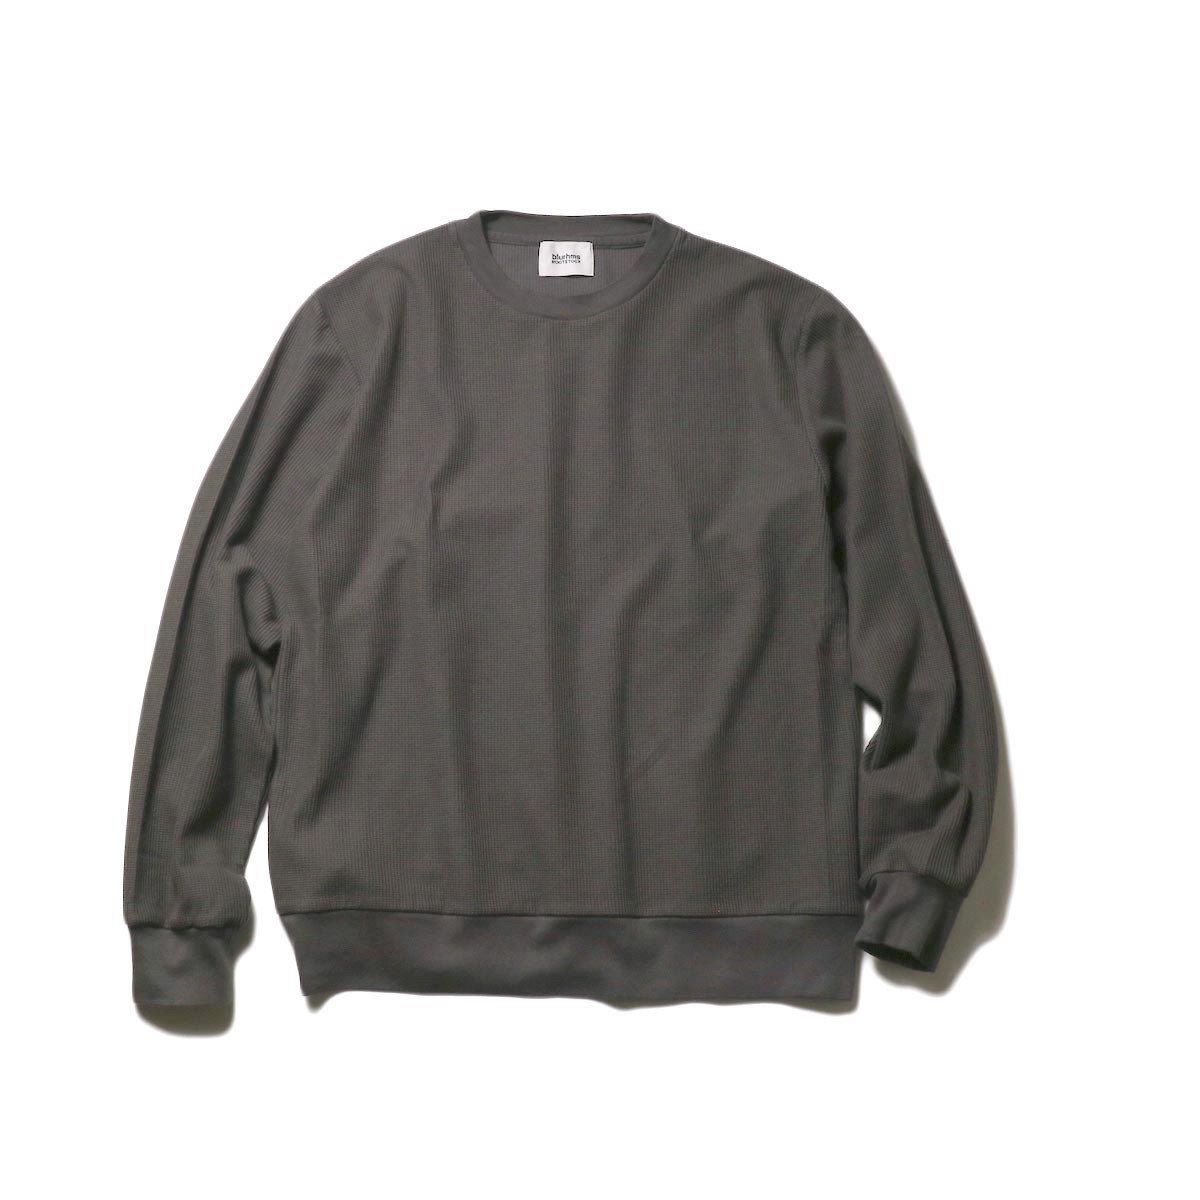 blurhms / New Rough & Smooth Thermal P/O Regular Fit (Dark Gray)